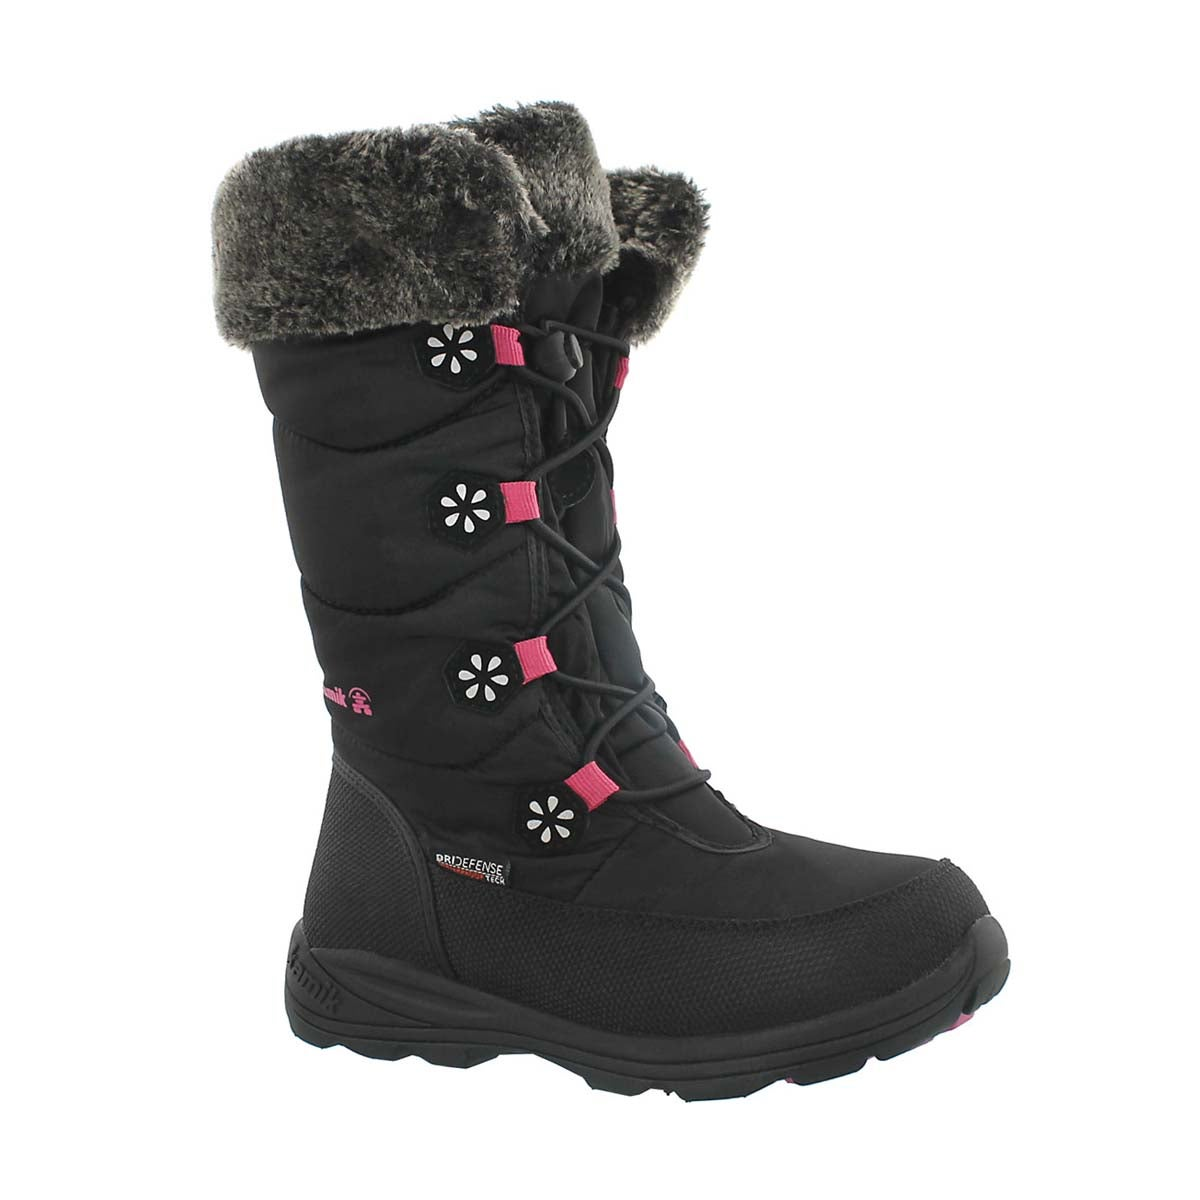 Girls' AVA black tall bungee winter boots